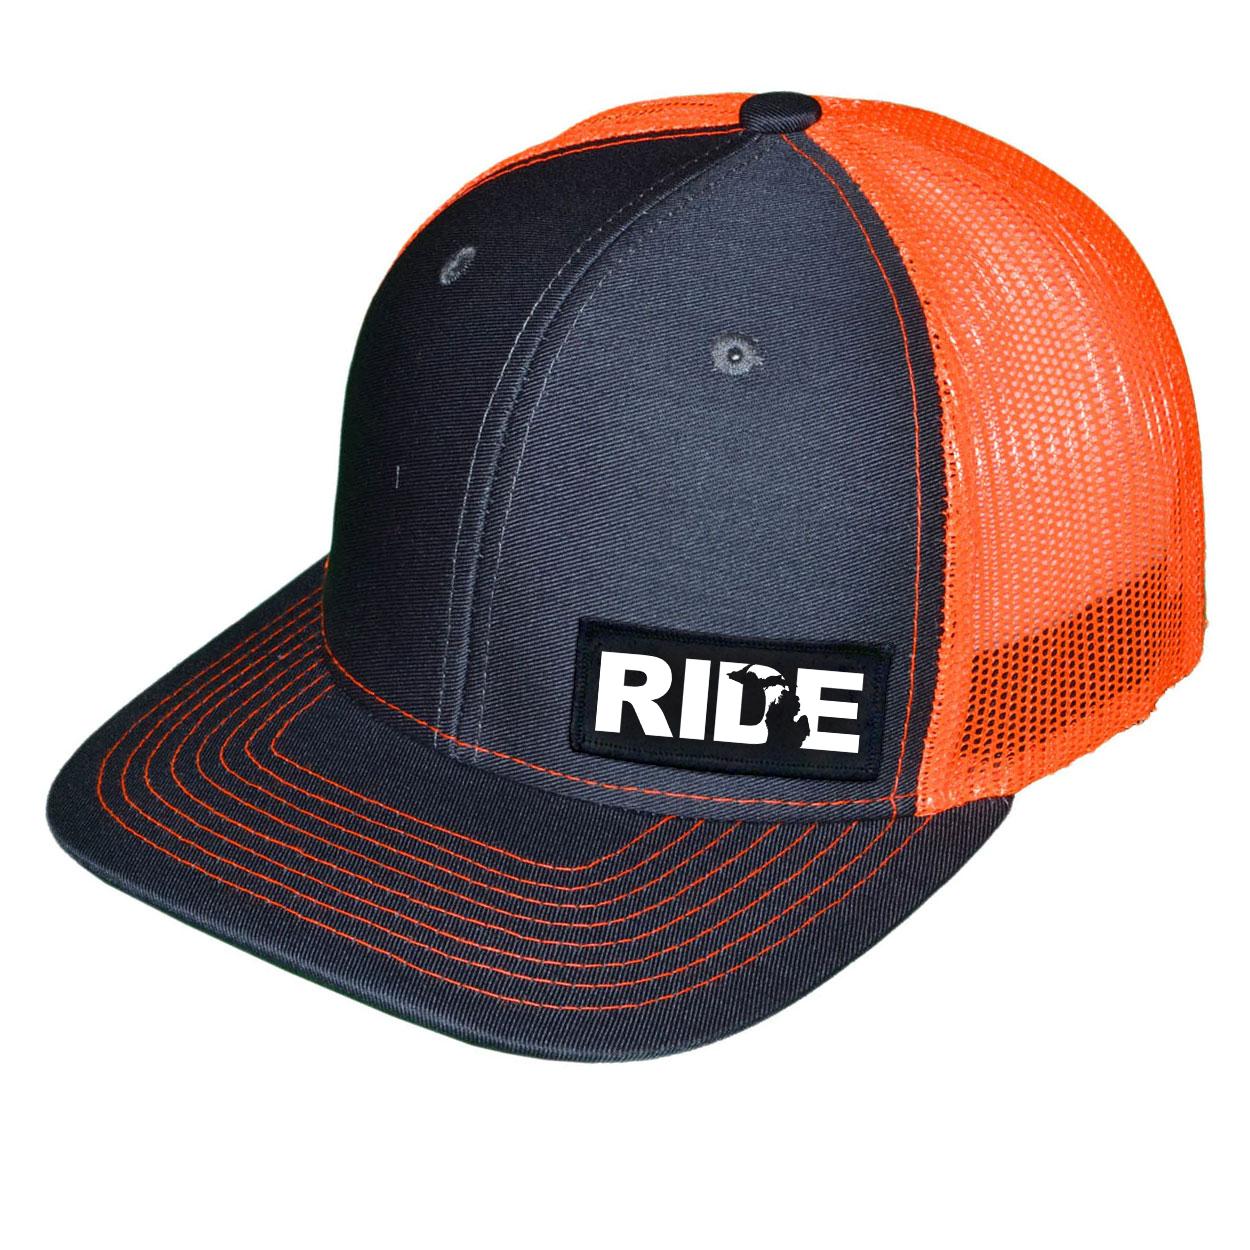 Ride Michigan Night Out Woven Patch Snapback Trucker Hat Dark Gray/Orange (White Logo)